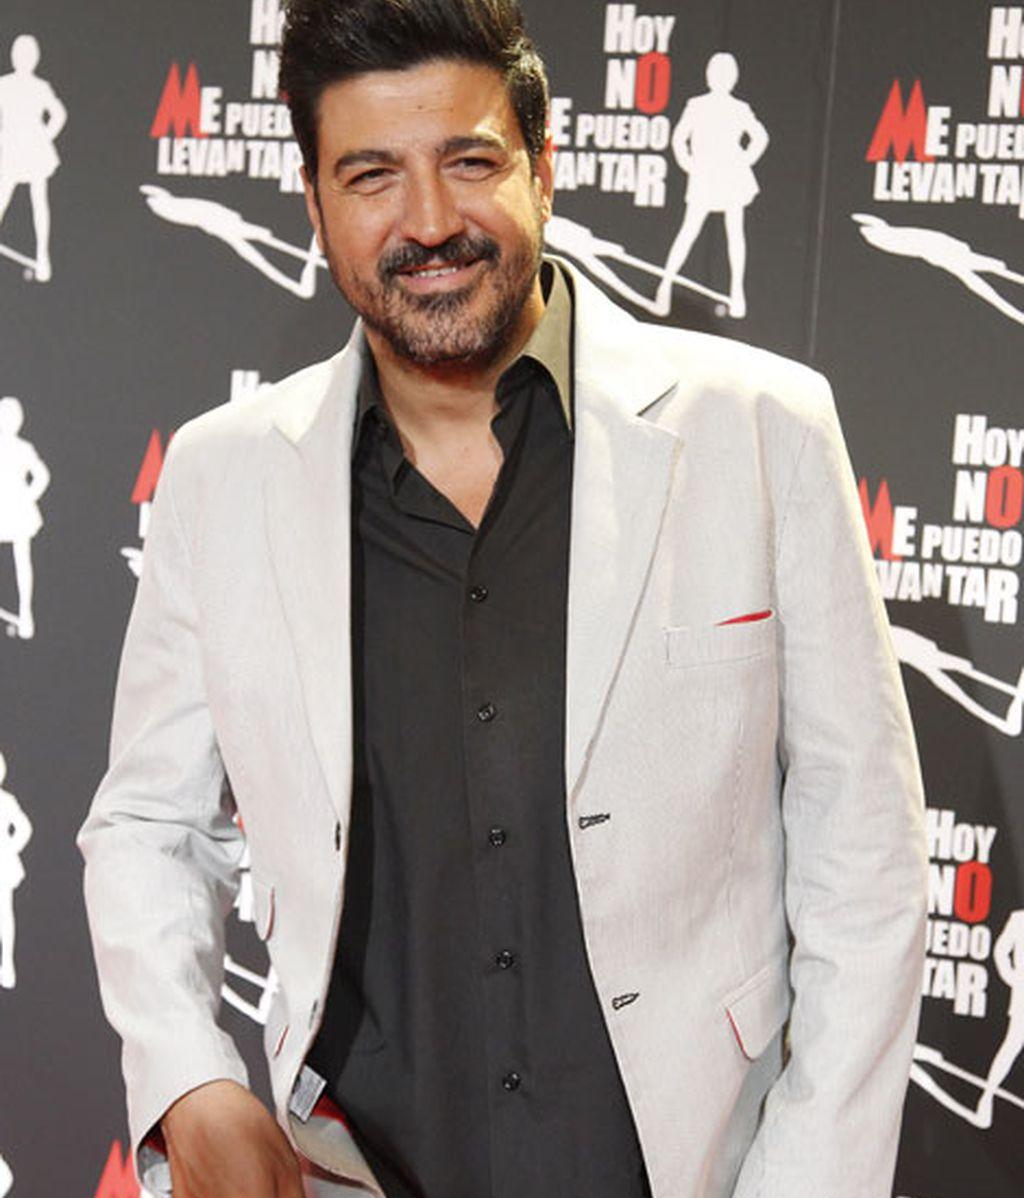 Tony Aguilar llevó una chaqueta clara y camisa negra